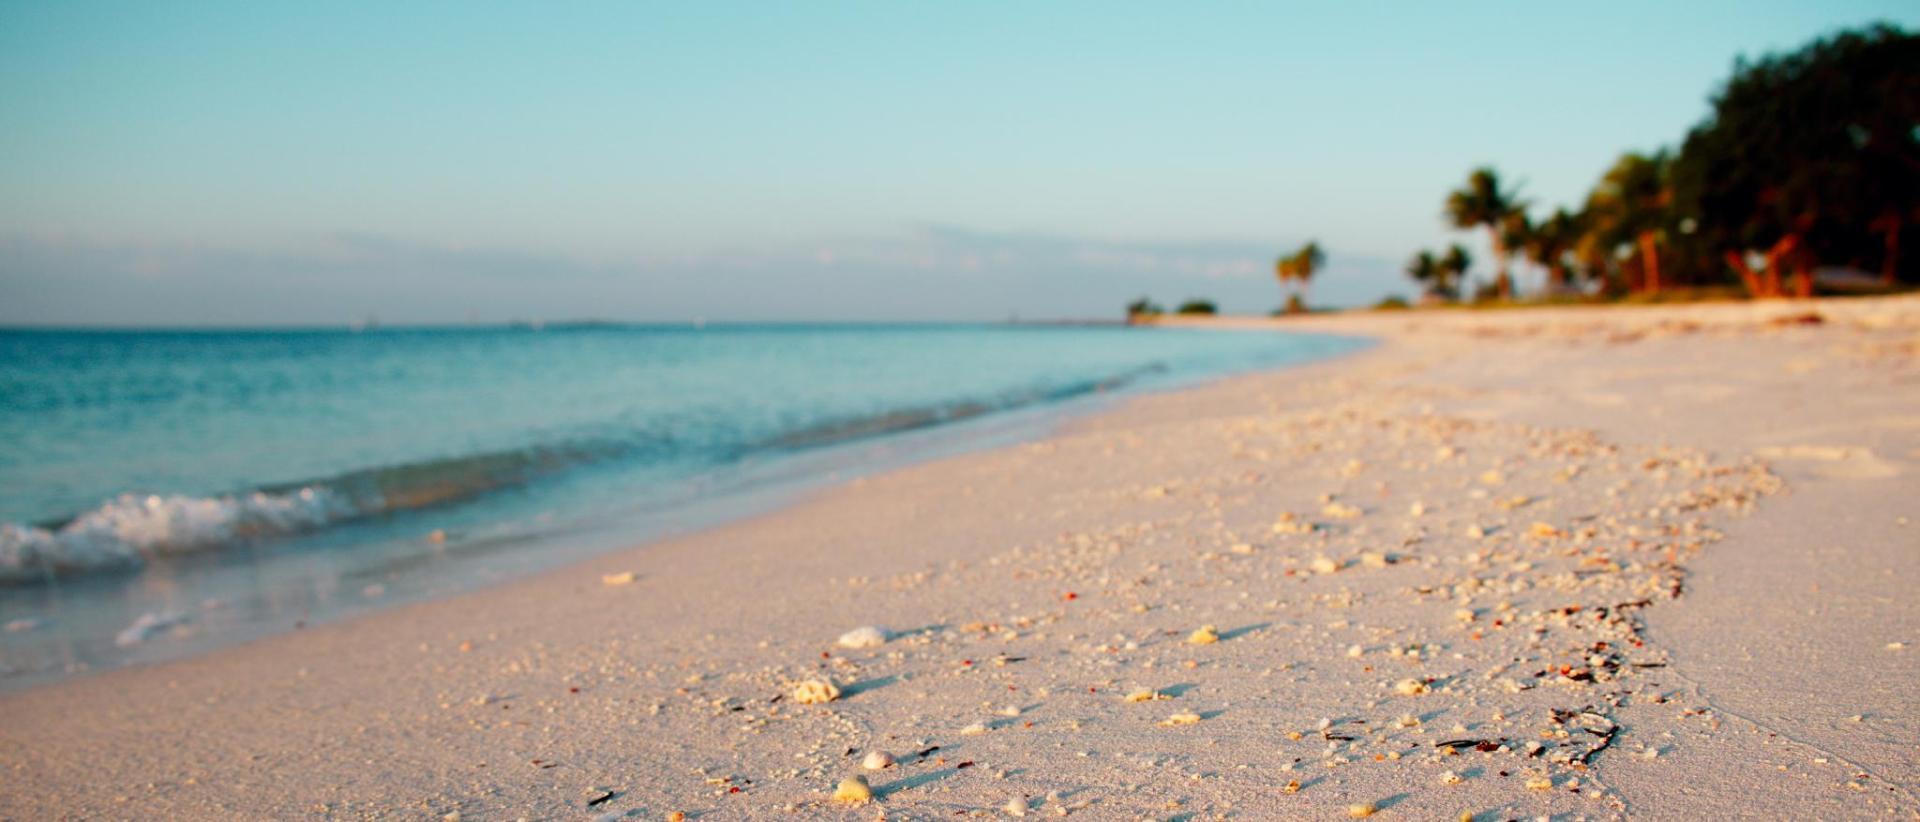 Hotels near Lazy Days South, Marathon FL   BEST HOTEL RATES Near ...